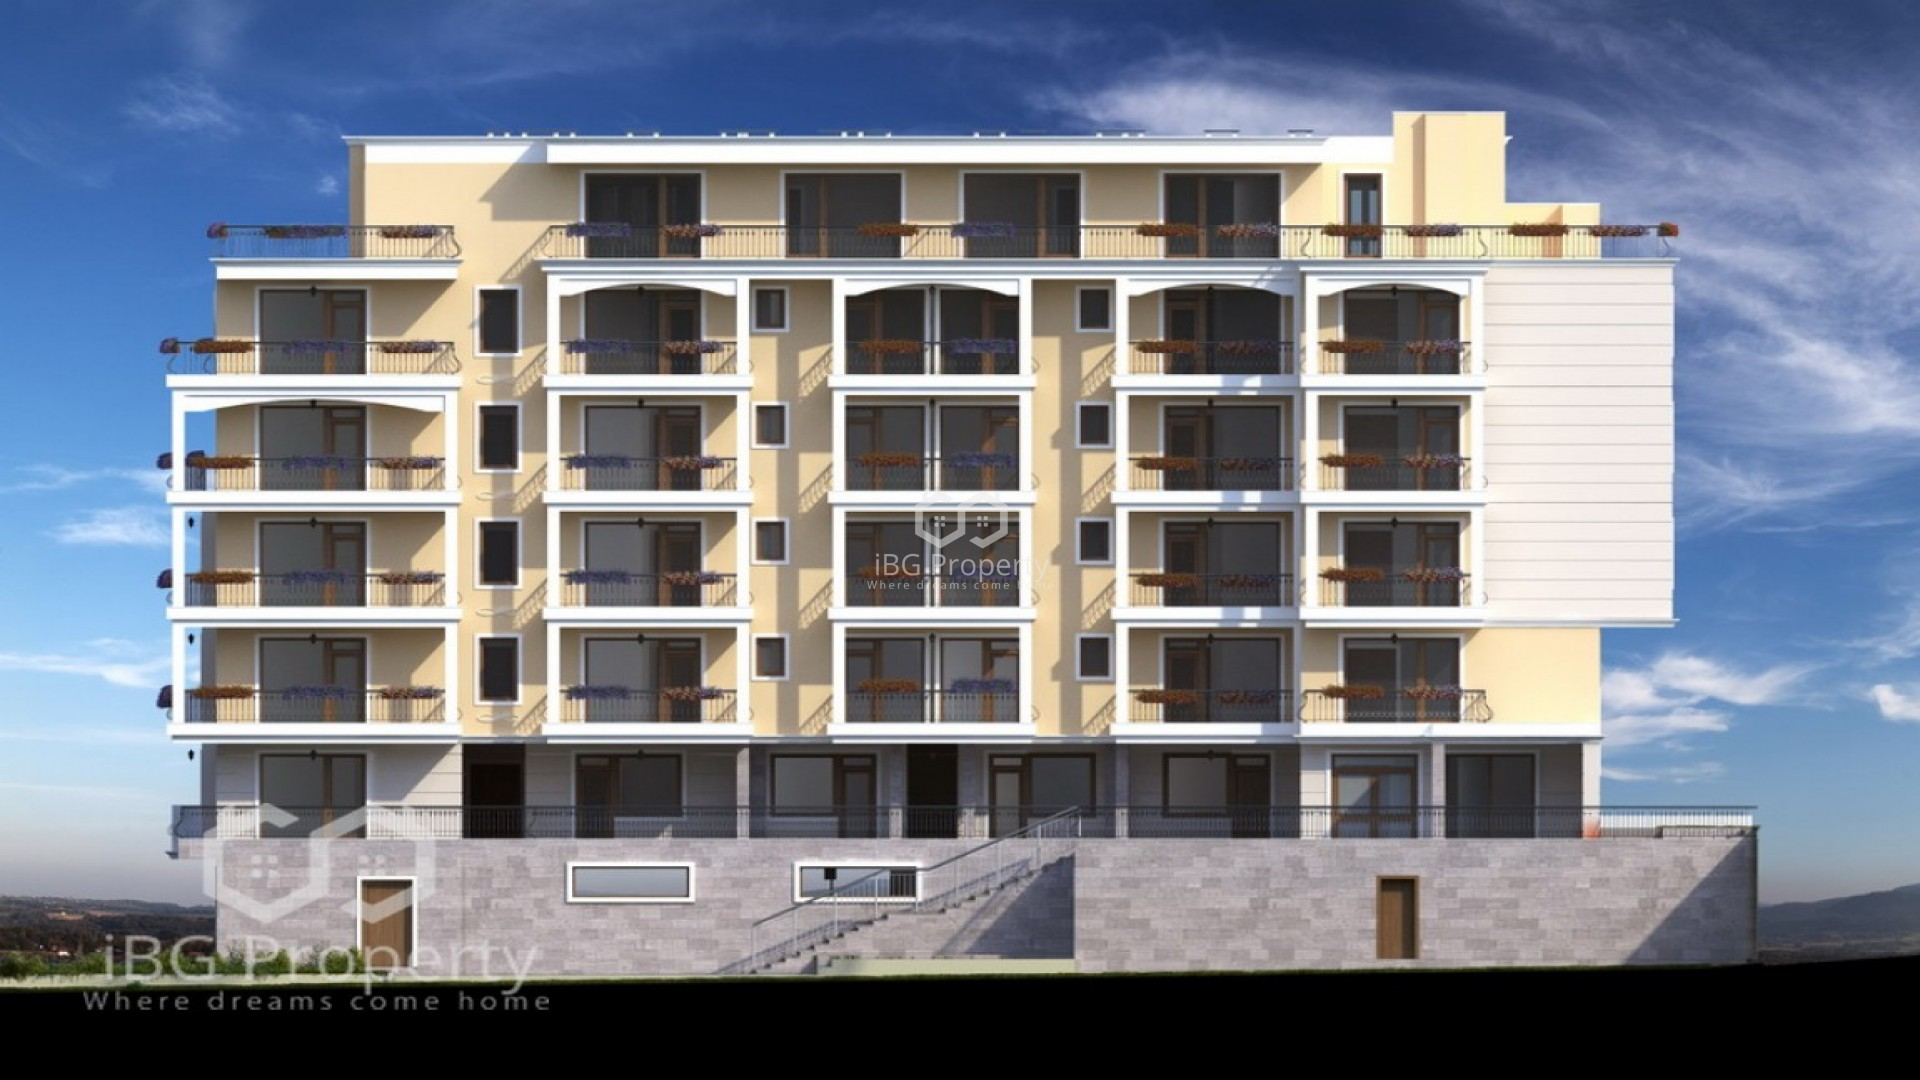 Однокомнатная квартира Святой Влас 51 m2